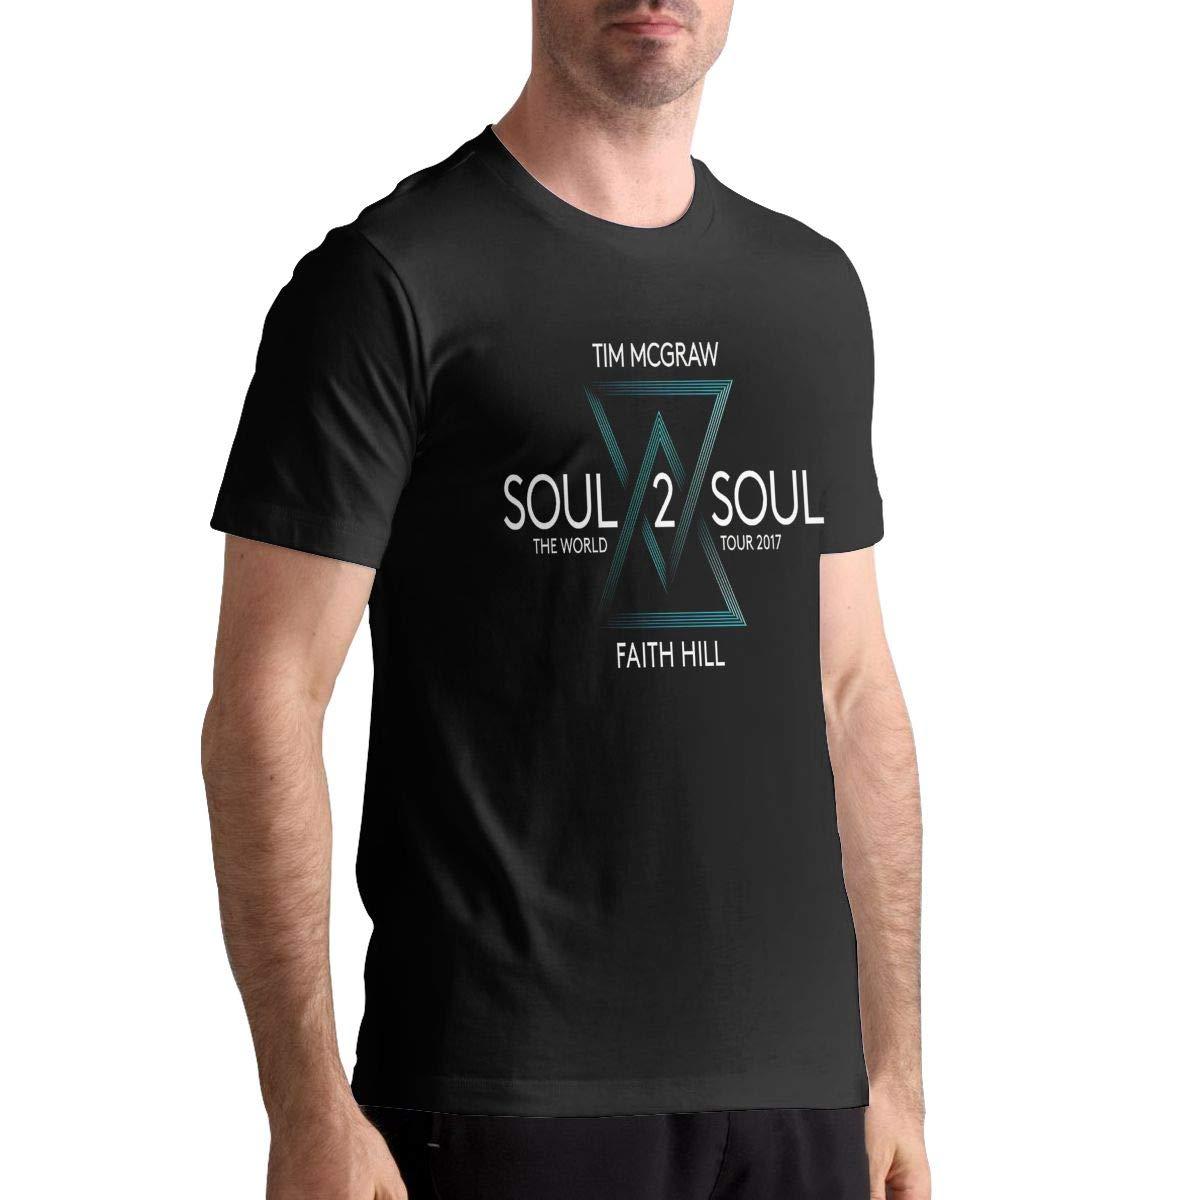 DanaMWatson Tim McGraw T Shirt Mens Cotton T Shirt Fashion Round Neck Short Sleeve Tops Tees